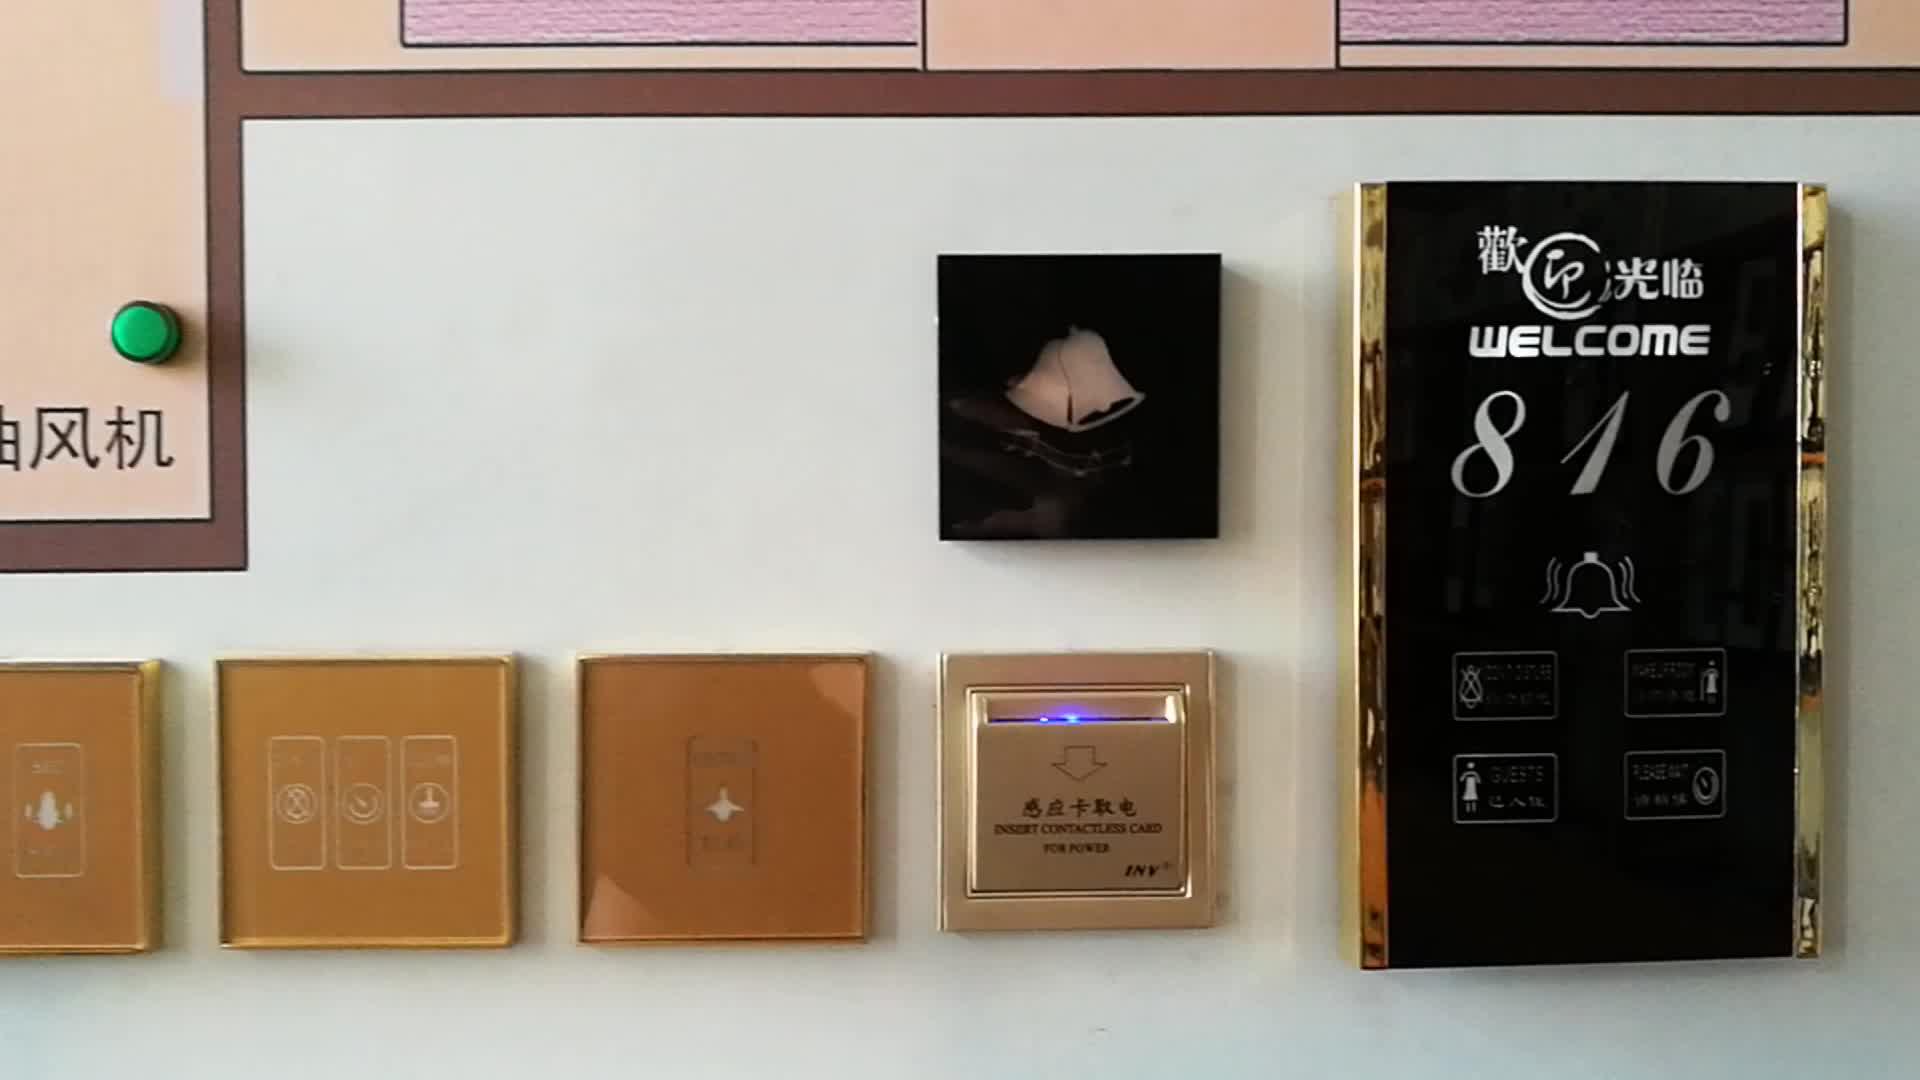 LED Digital Display Hotel Doorplate Room Number